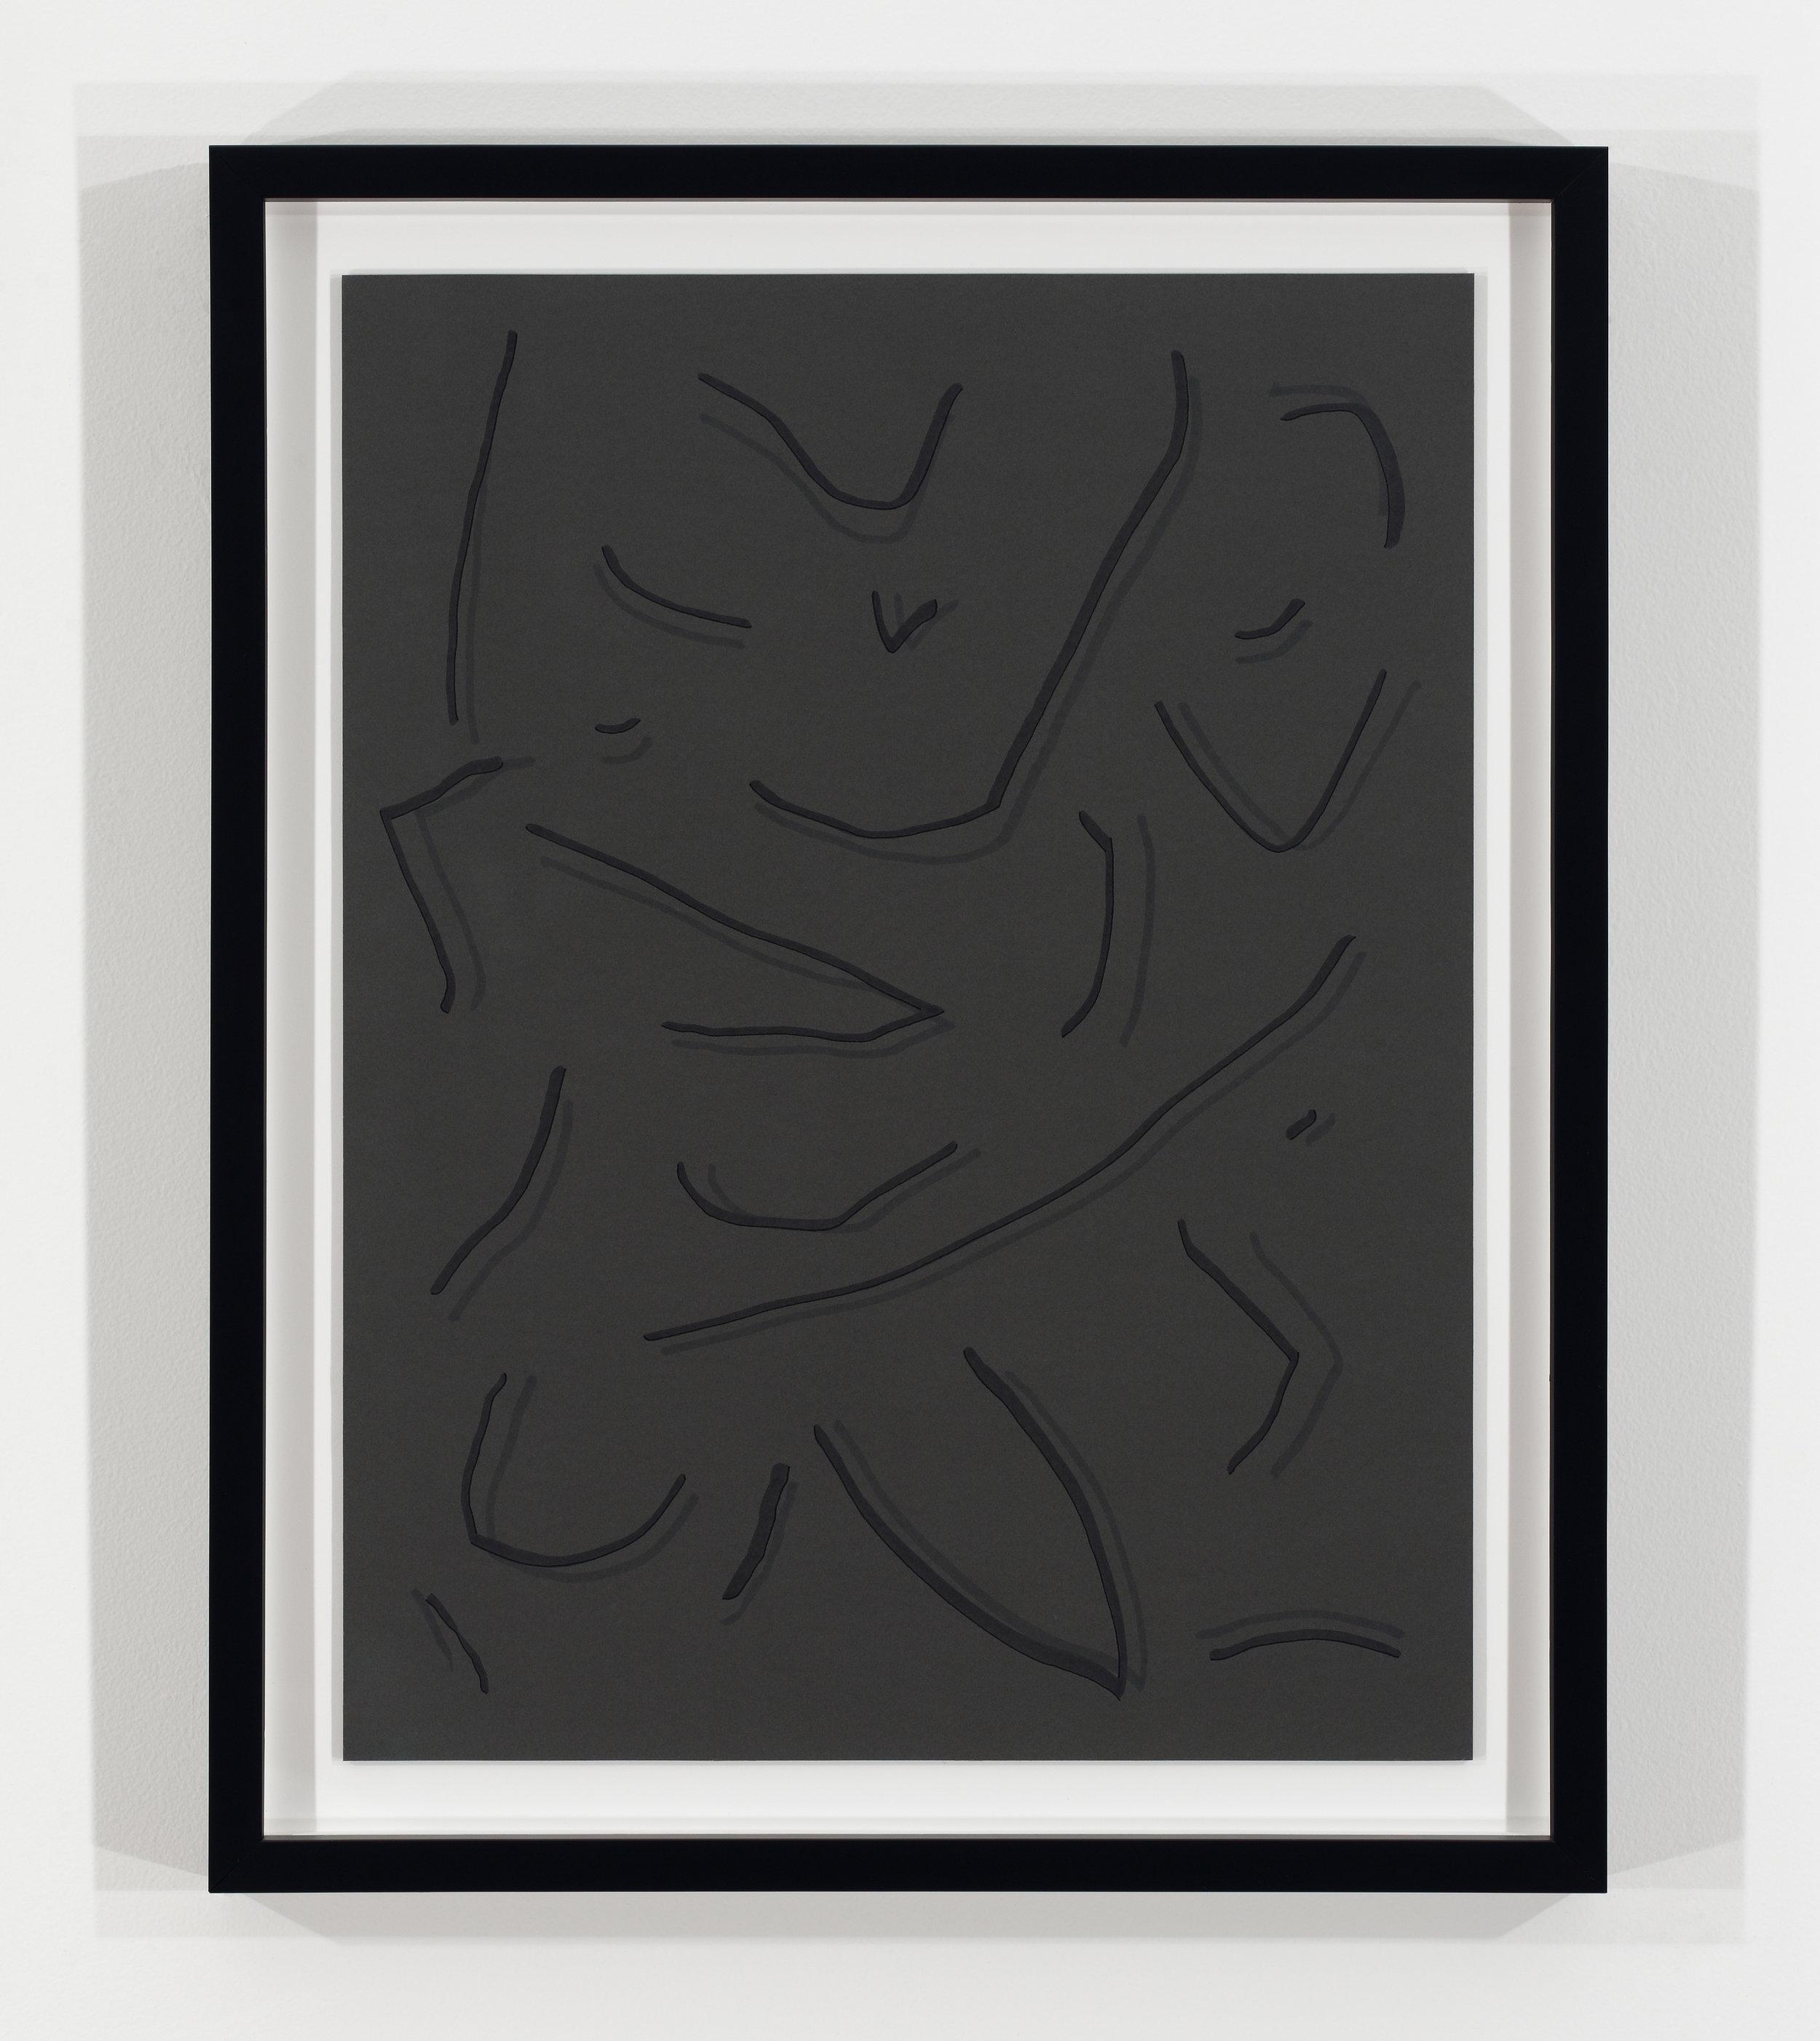 Tom Mueske, Orange County Museum of Art, California Biennial, 2010